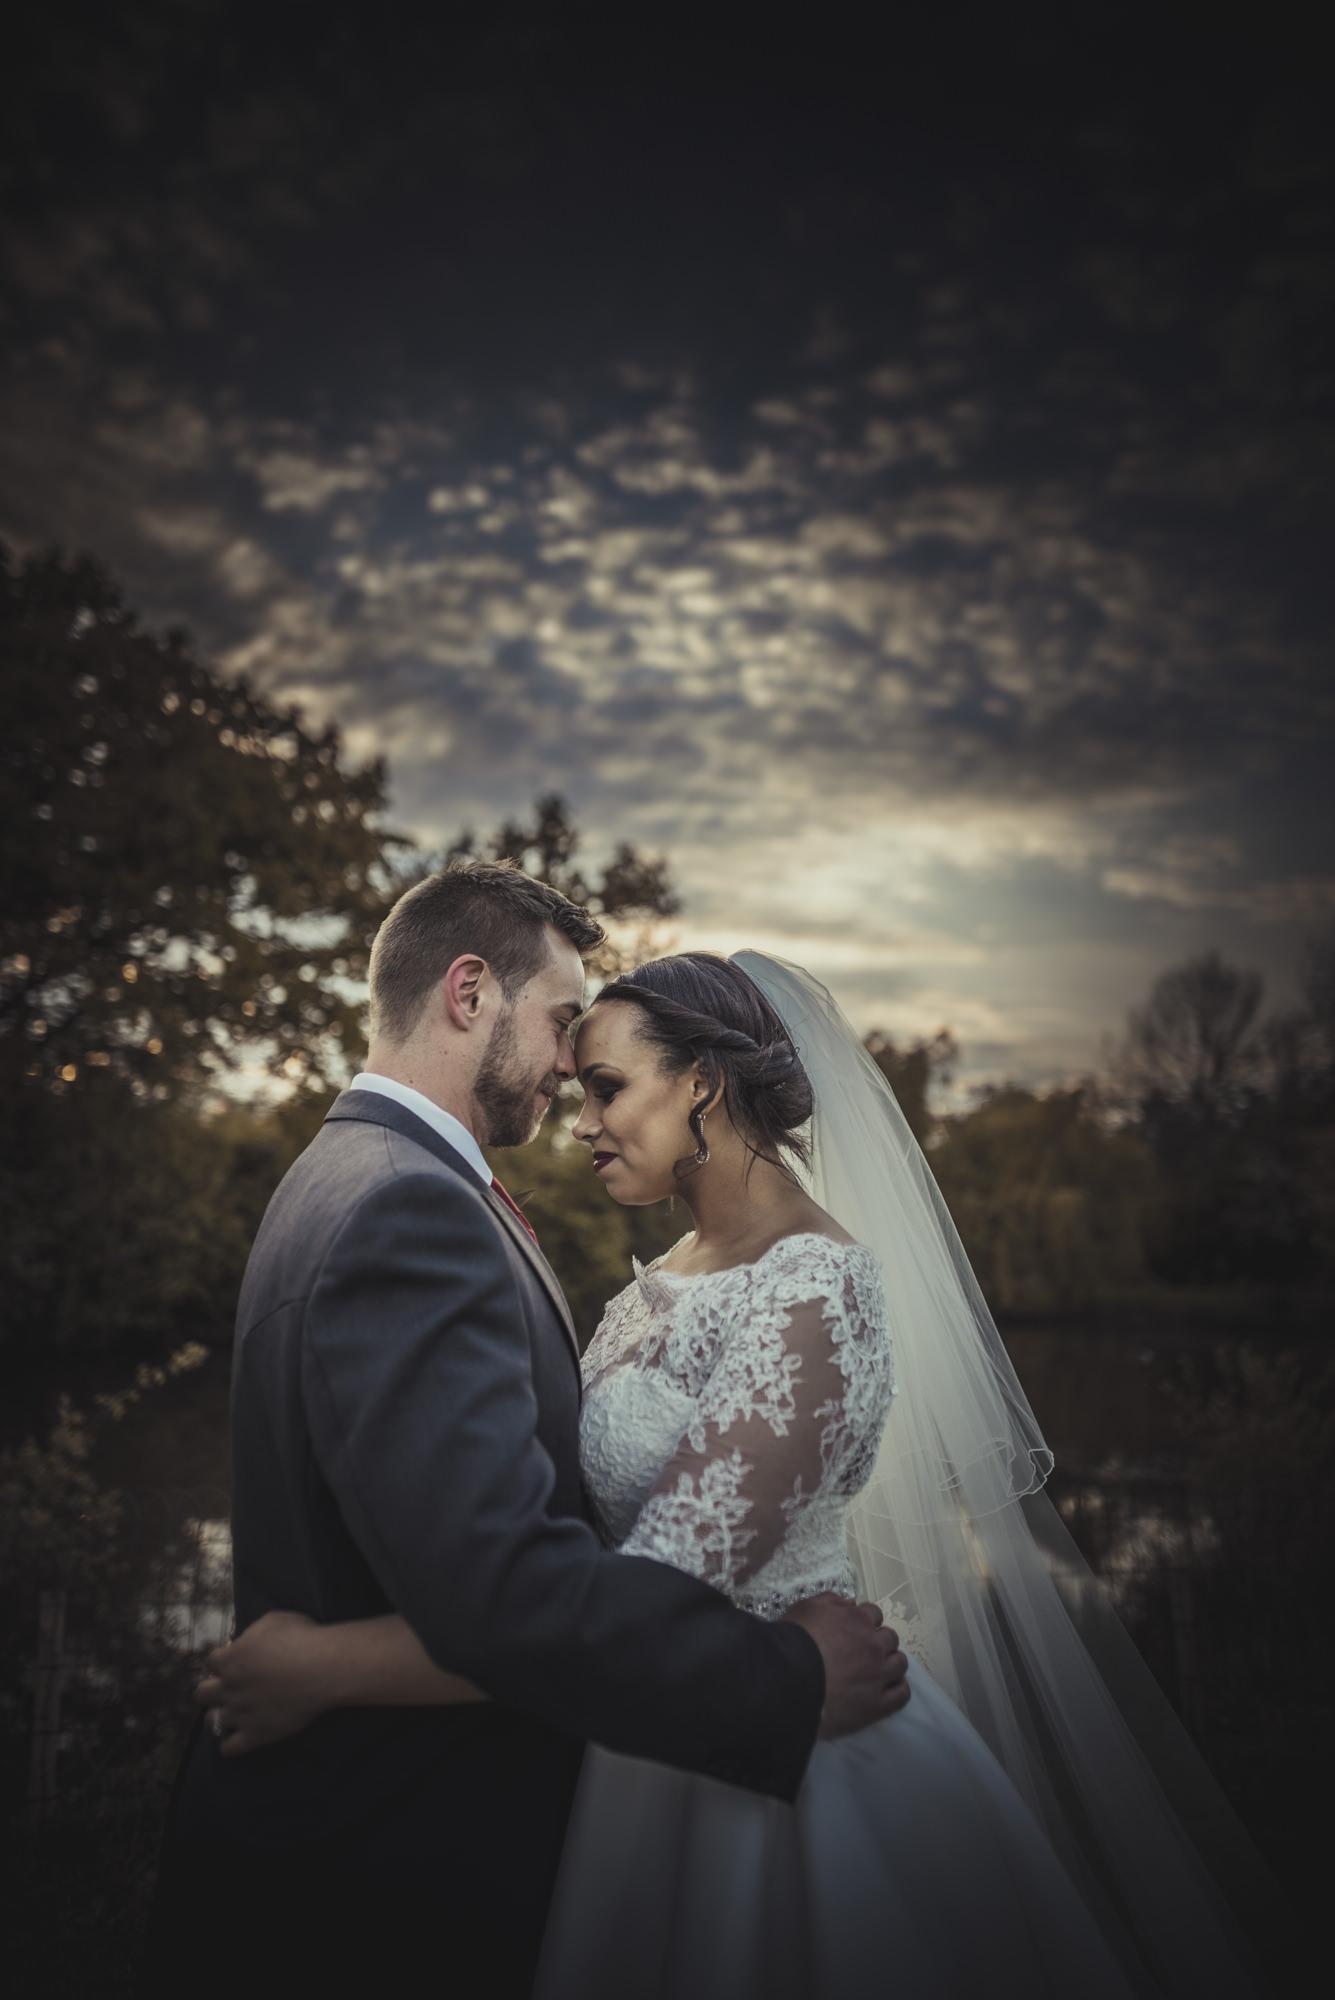 Jacqueline-Gareth-Wedding-Westmead-Events-Surrey-Manu-Mendoza-Wedding-Photography-494.jpg